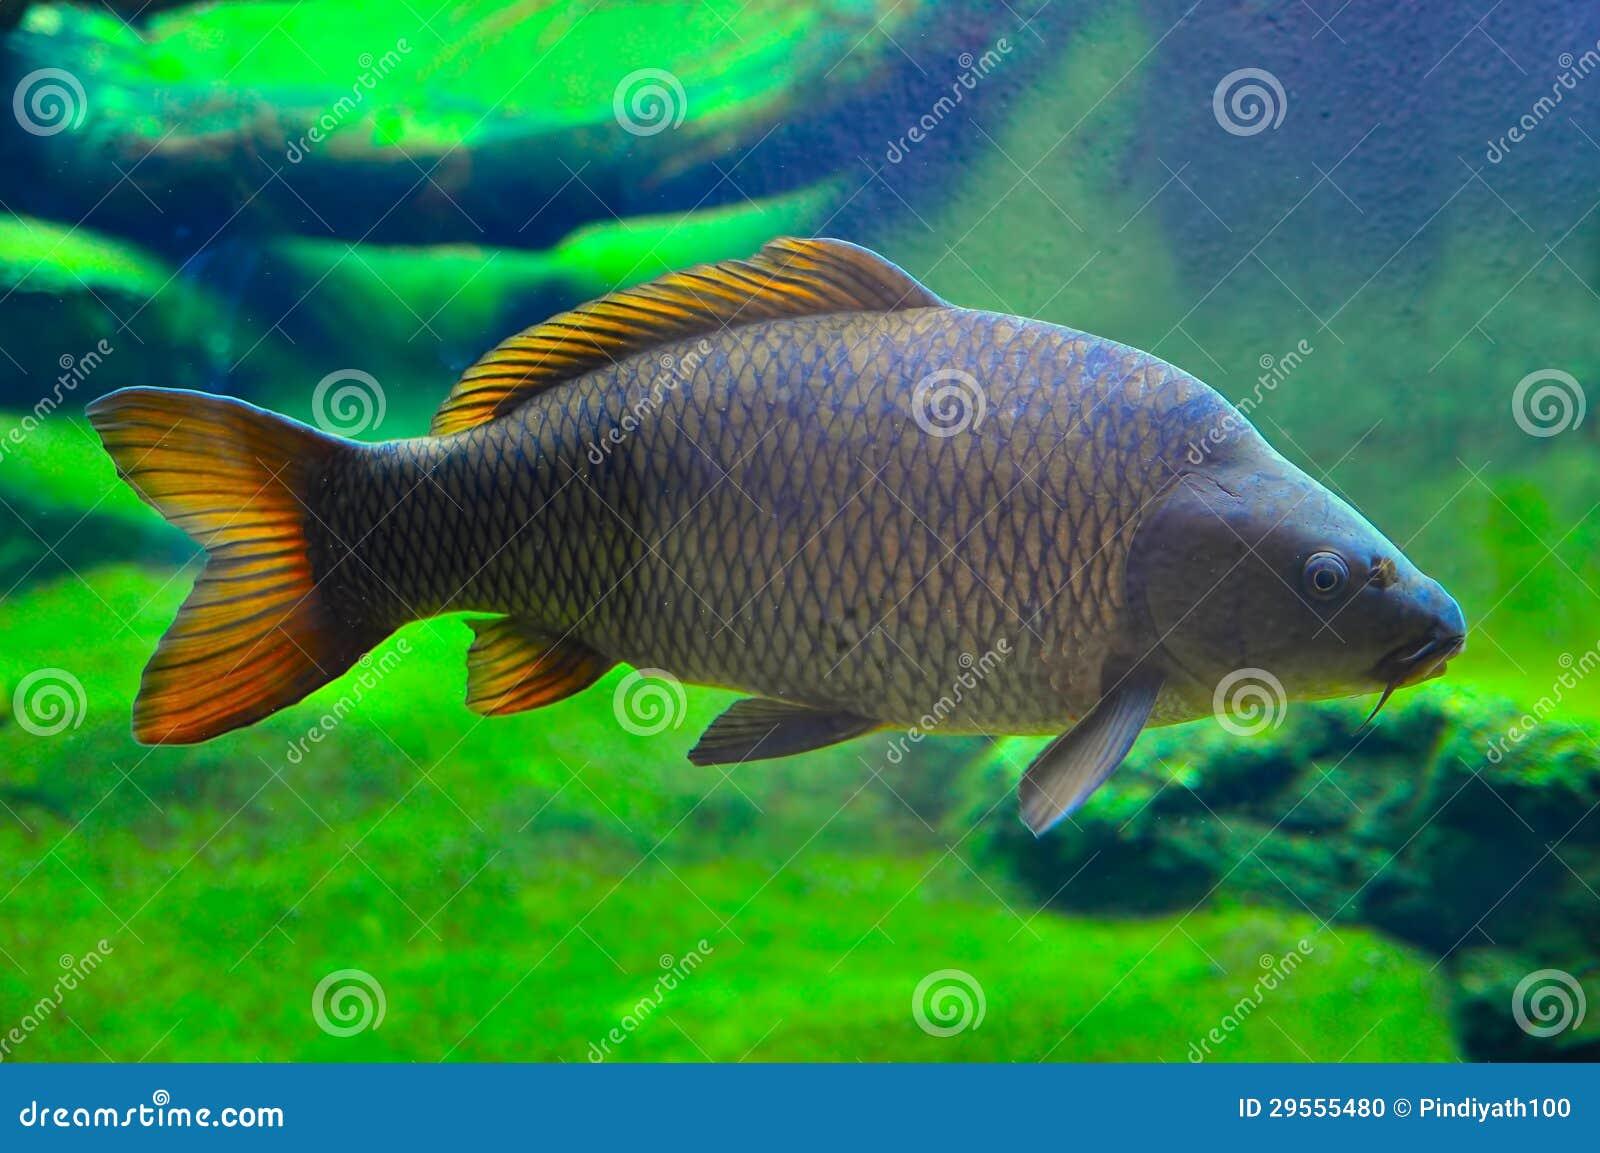 Japanese carp fish stock photo image 29555480 for Japanese carp fish